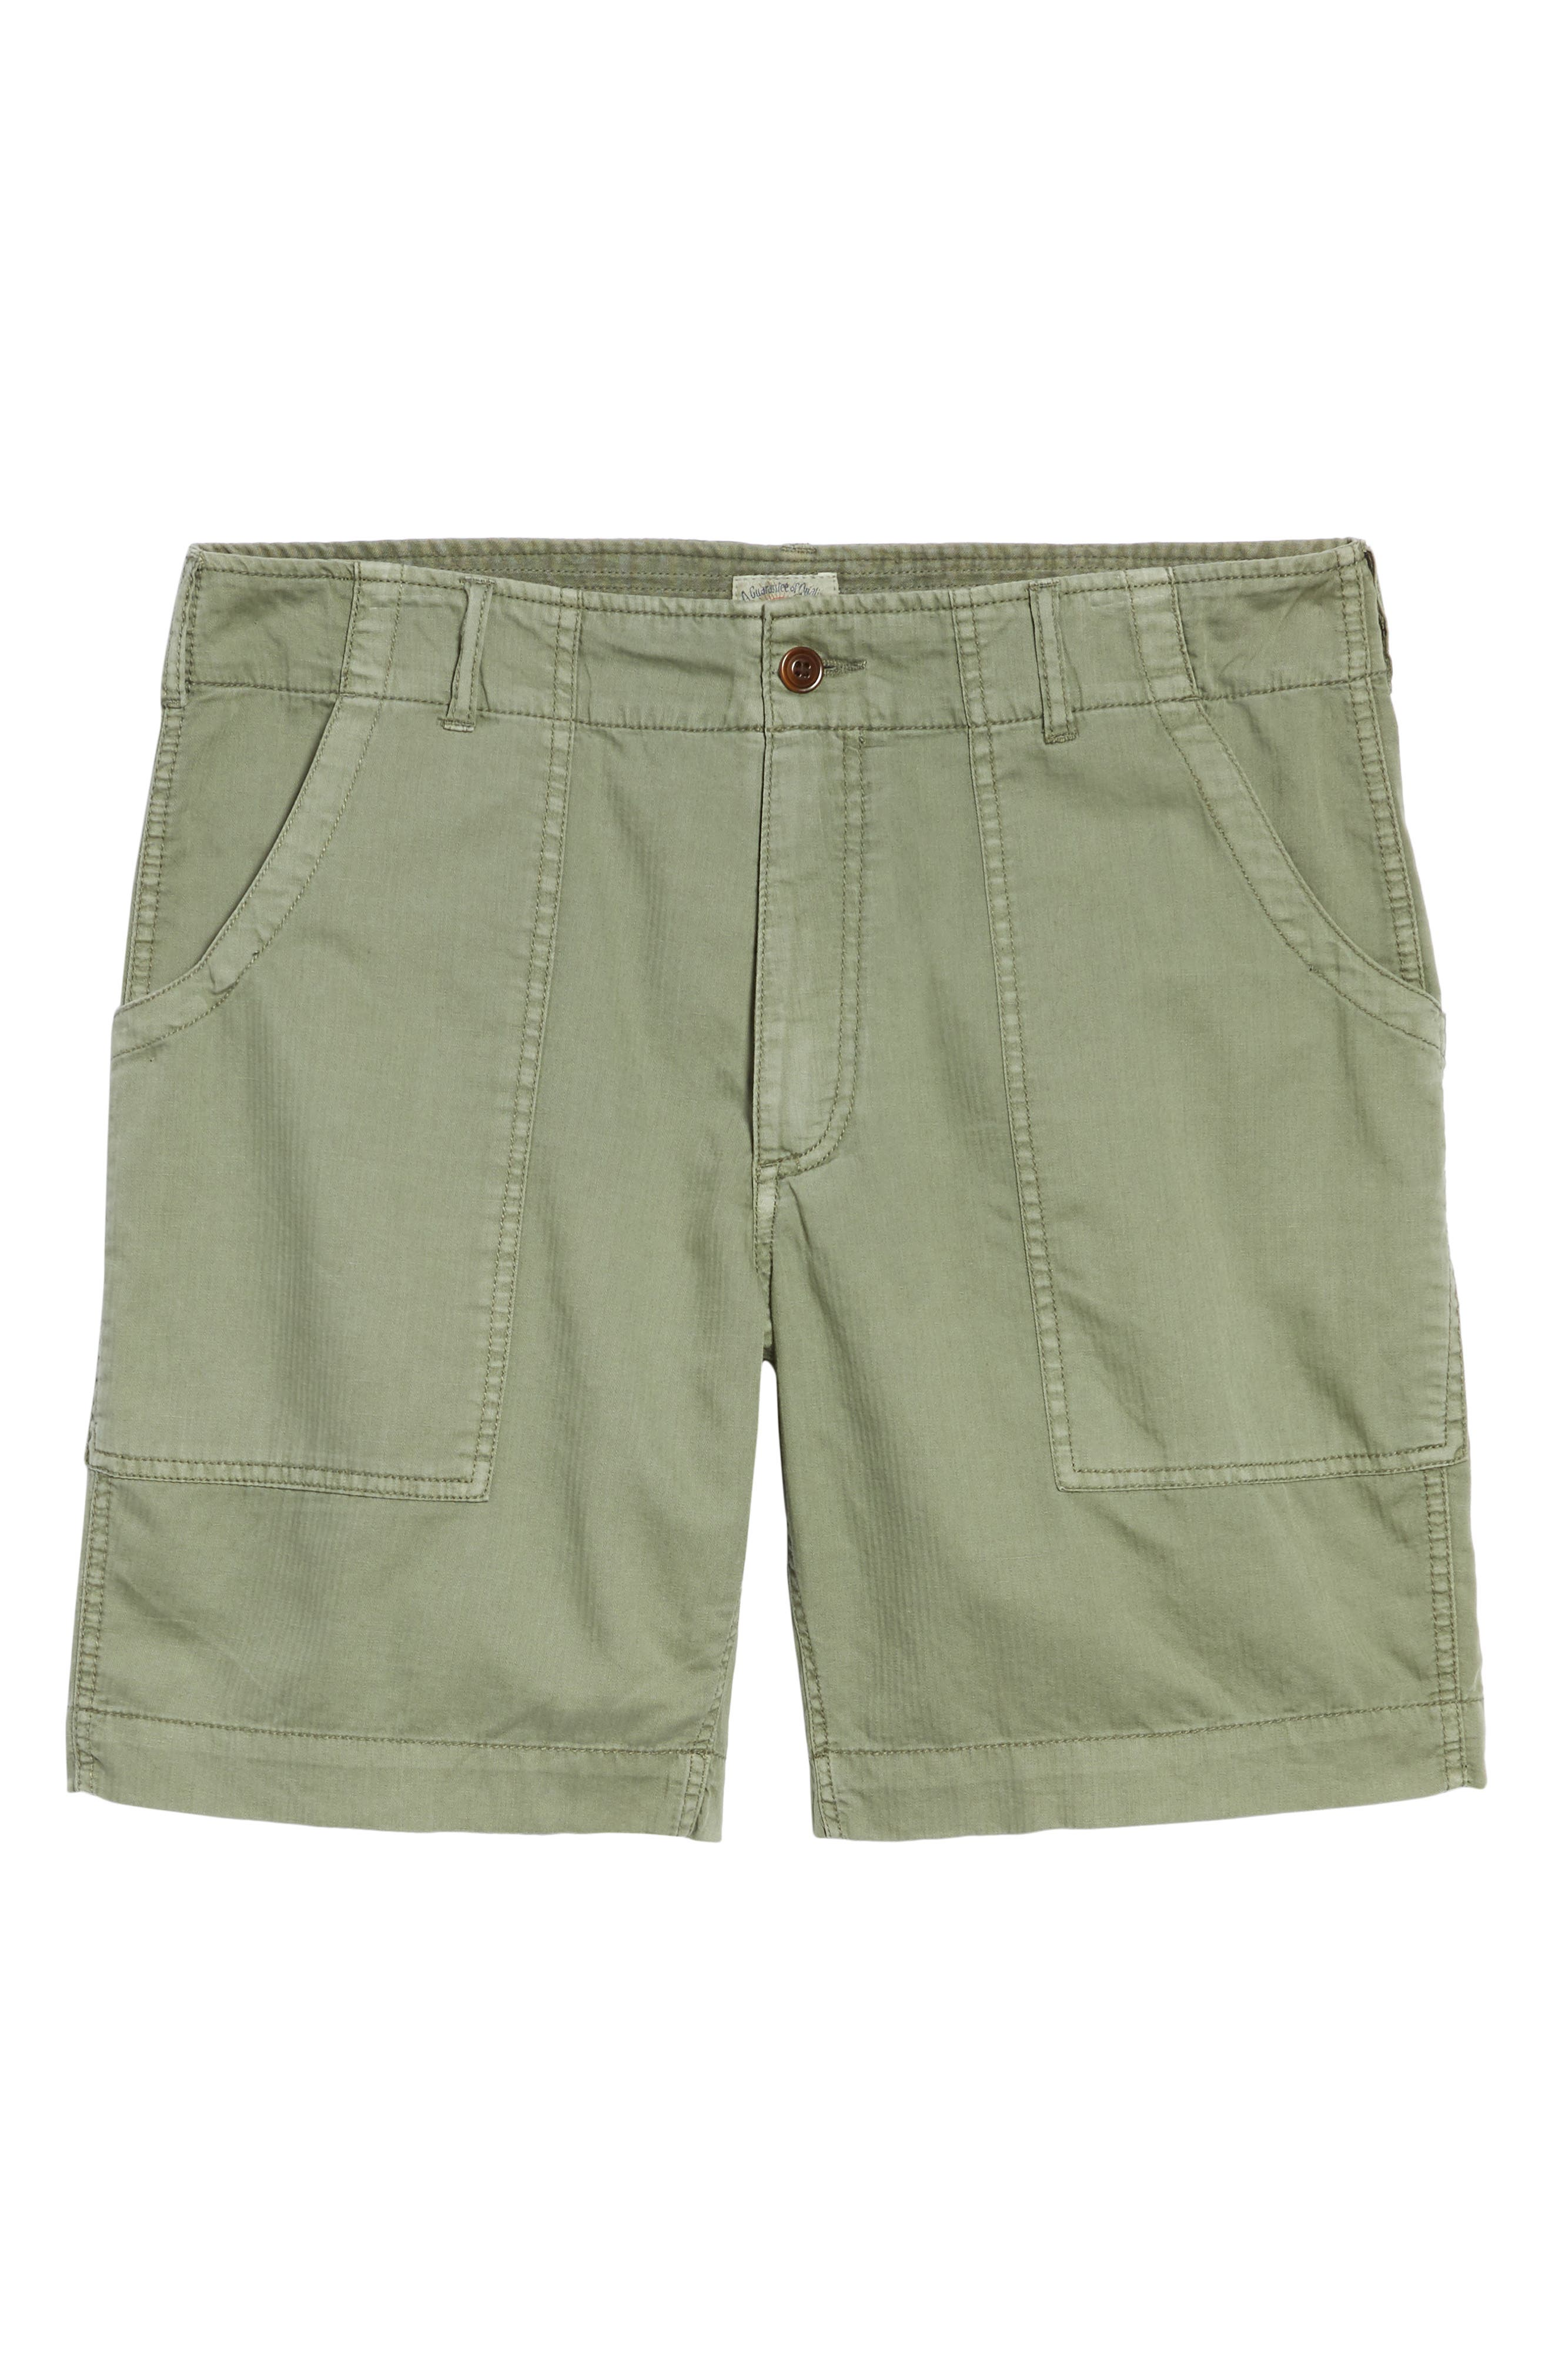 Radar Camp Shorts,                             Alternate thumbnail 6, color,                             Olive